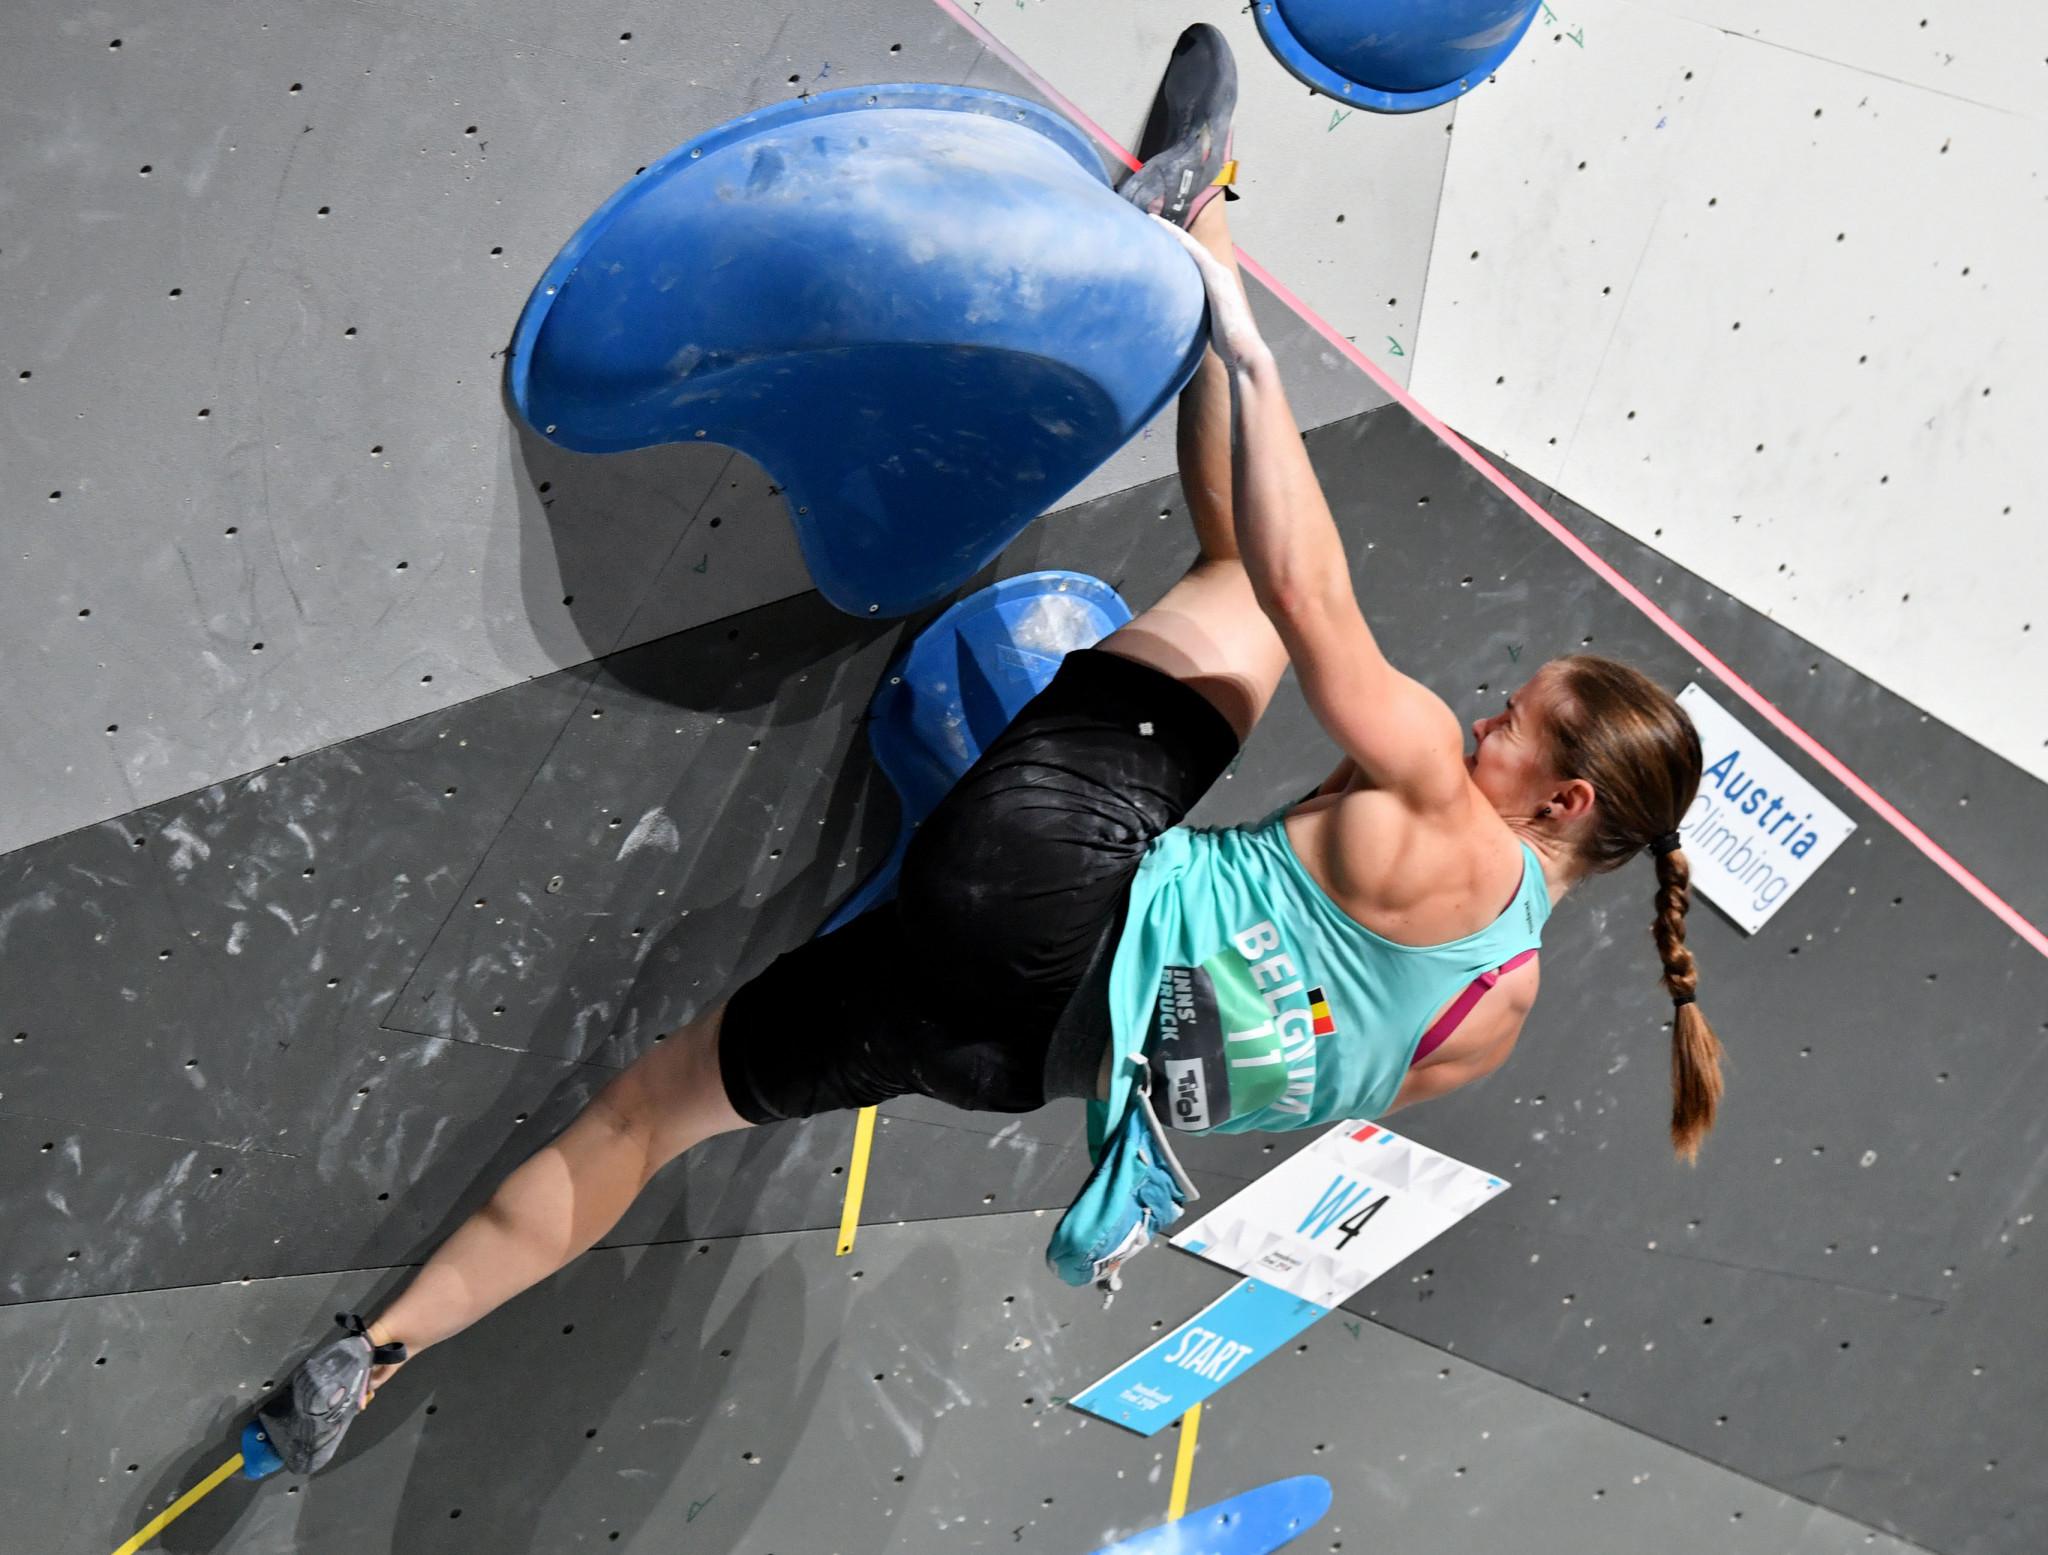 Caulier tops women's boulder qualifying at IFSC European Championships